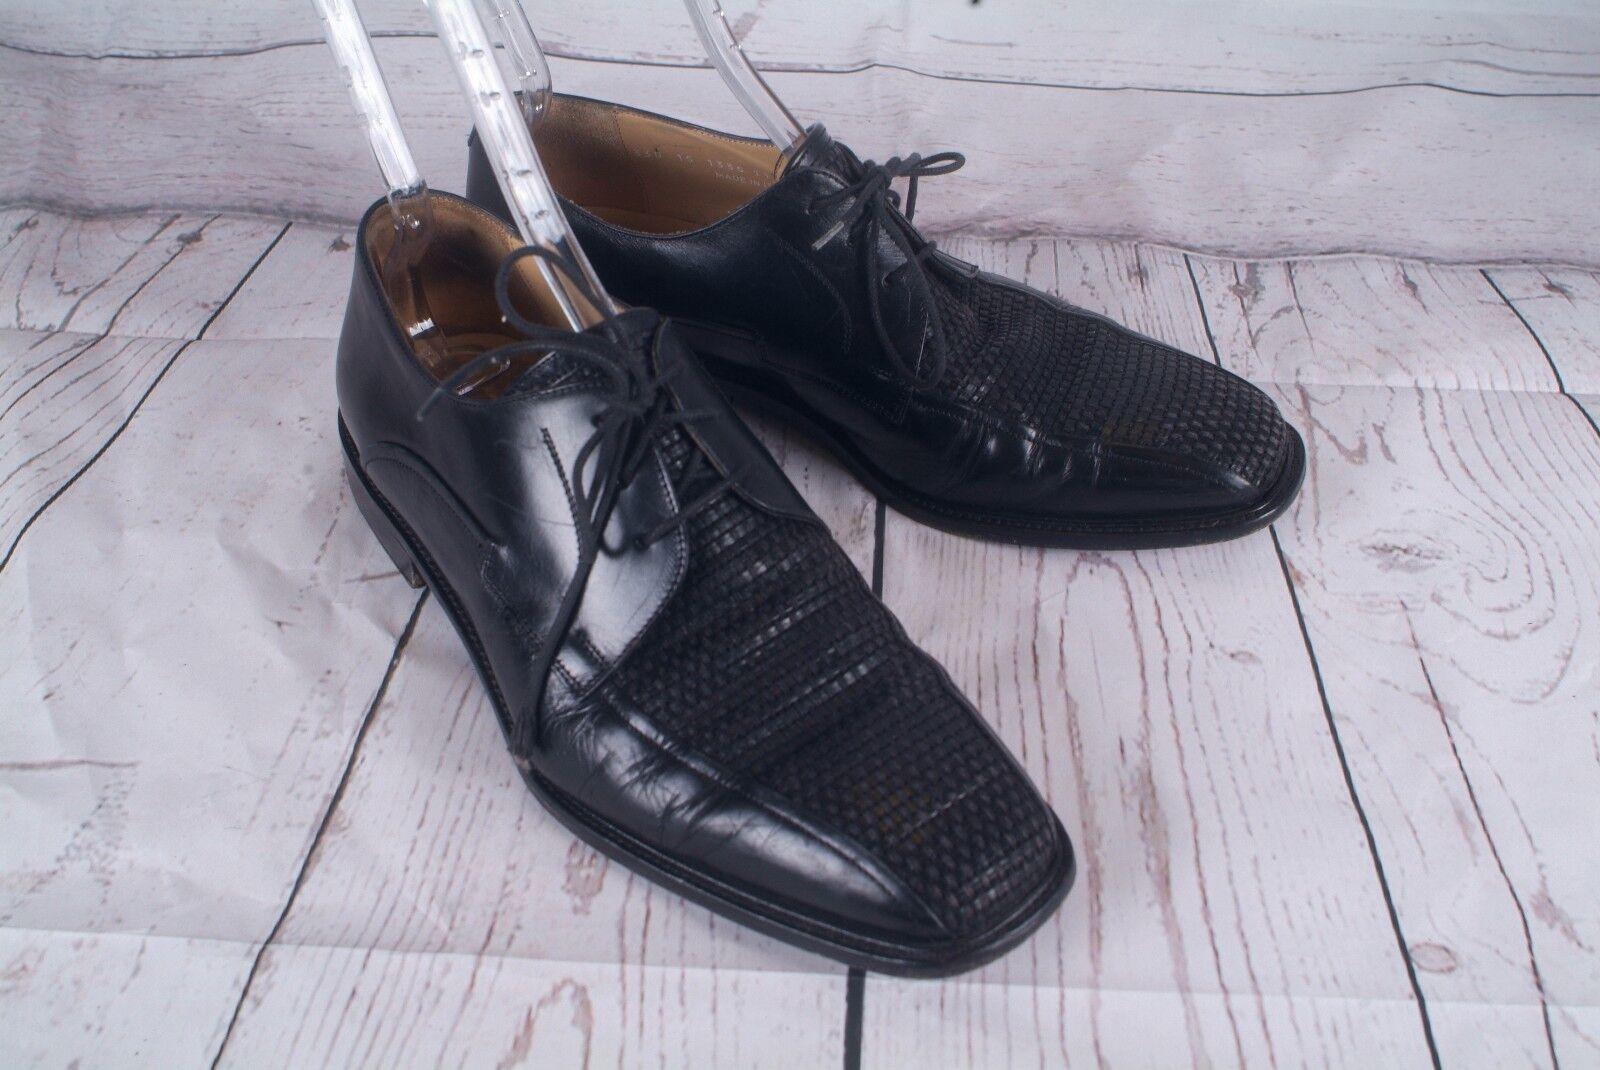 Johnston & Murphy Basket weave  black lace up shoes  leather  11M (F)